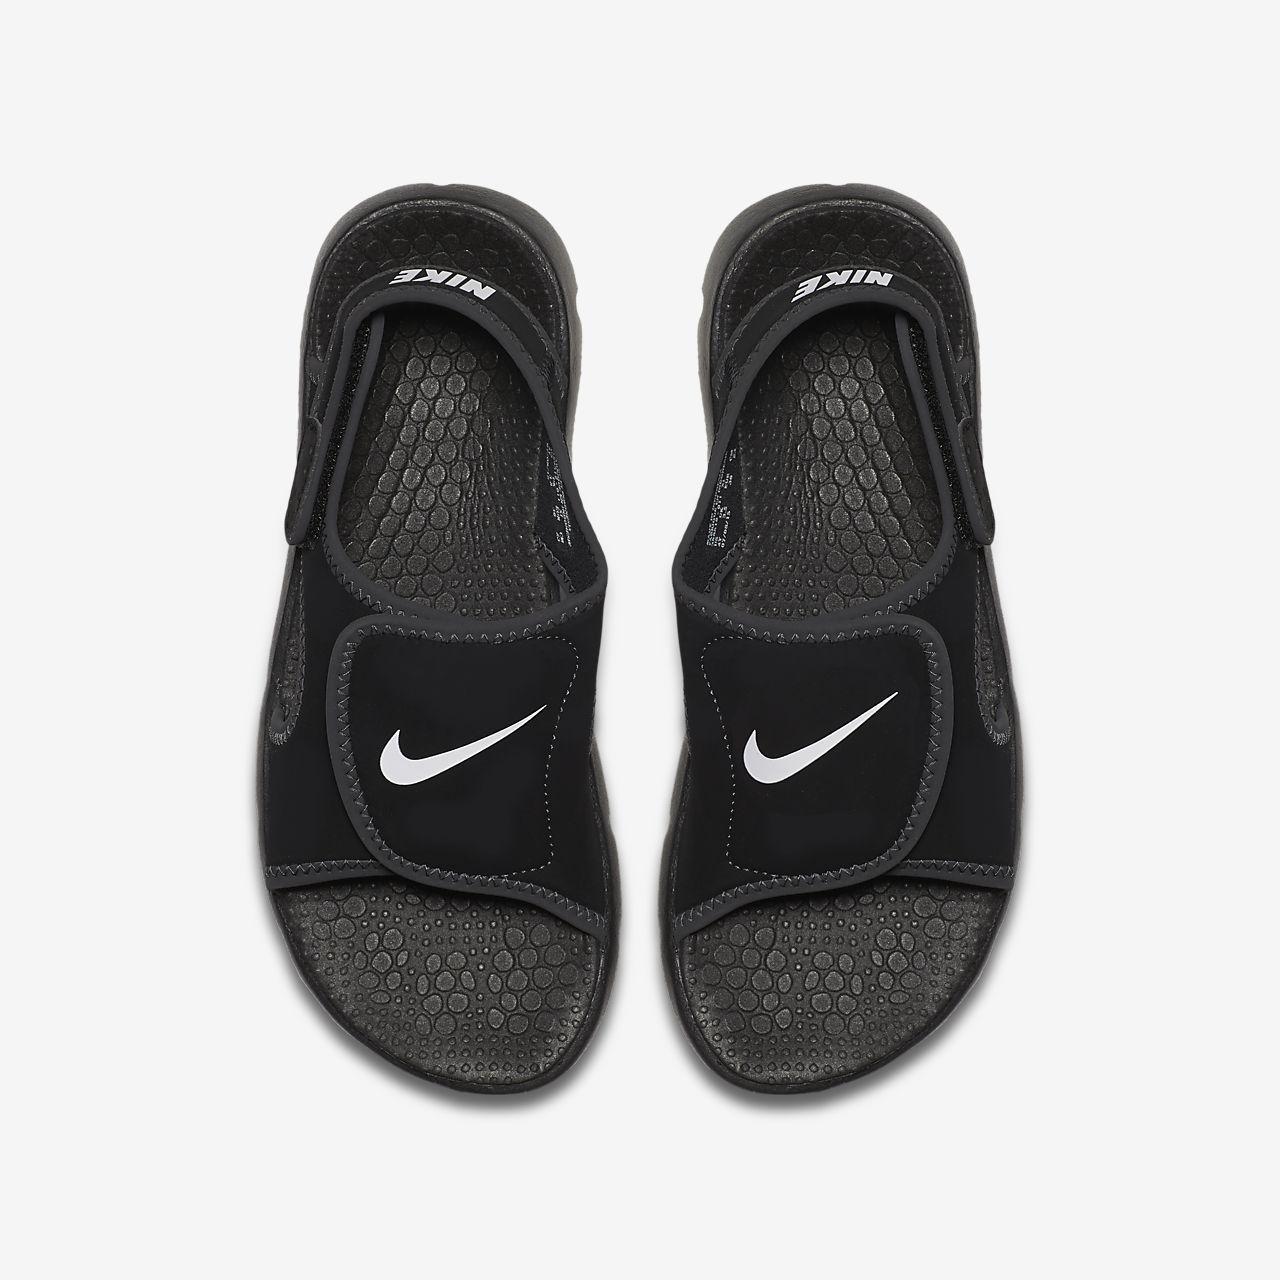 ... Nike Sunray Adjust 4 (10.5c-7y) Boys' Shoe